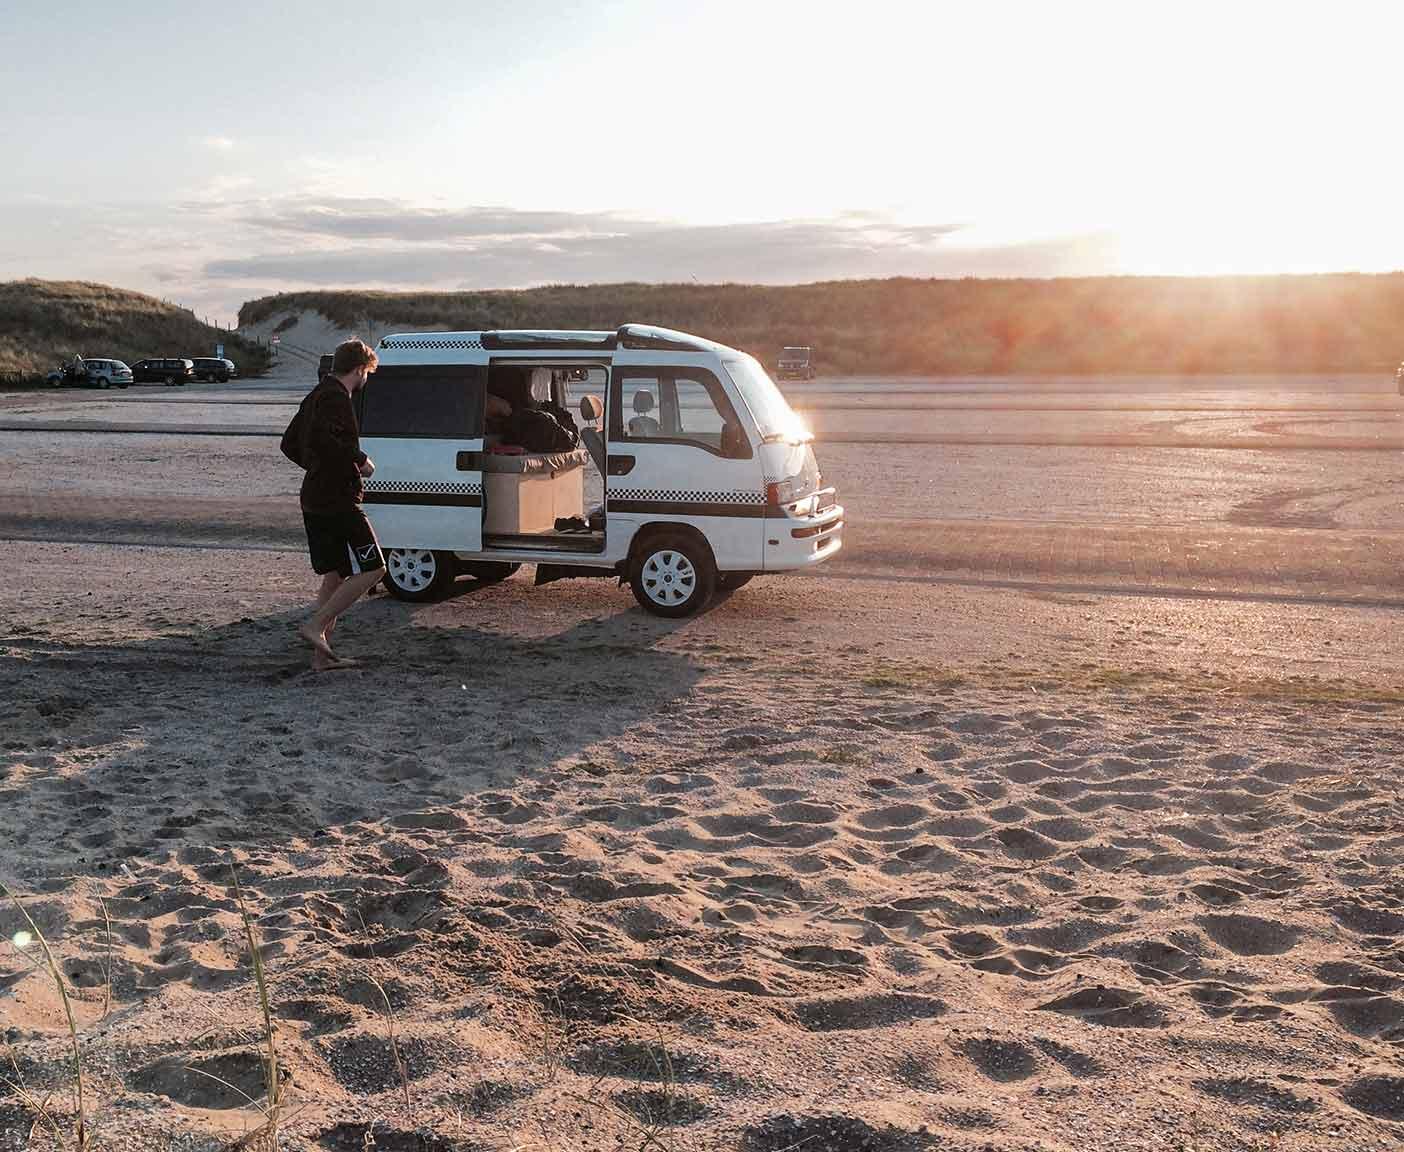 umbau-e10-4x4-allrad-camper-minicamper-daihatsu-hijet-piaggio-porter-6